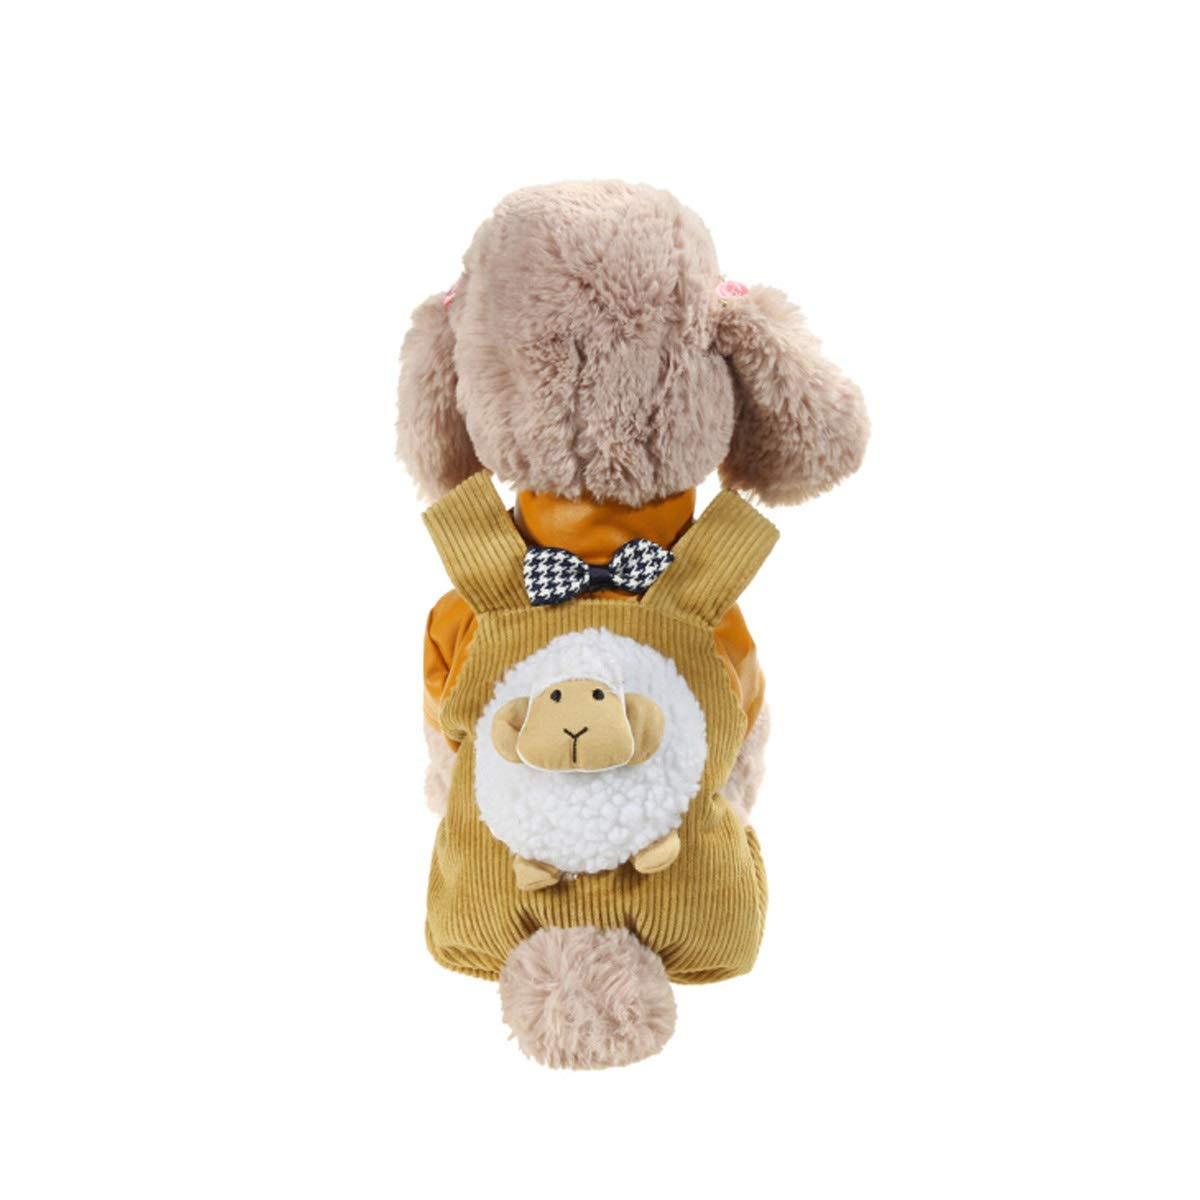 Khaki XL Khaki XL Guyuexuan Small and Medium-Sized Dog Pet Dog Clothes, Spring Four-Legged Clothes, Puppies Spring and Autumn Thin Section, Summer Teddy Bear Dog Princess, Bread Sheep Four-Legged Clothing Autumn